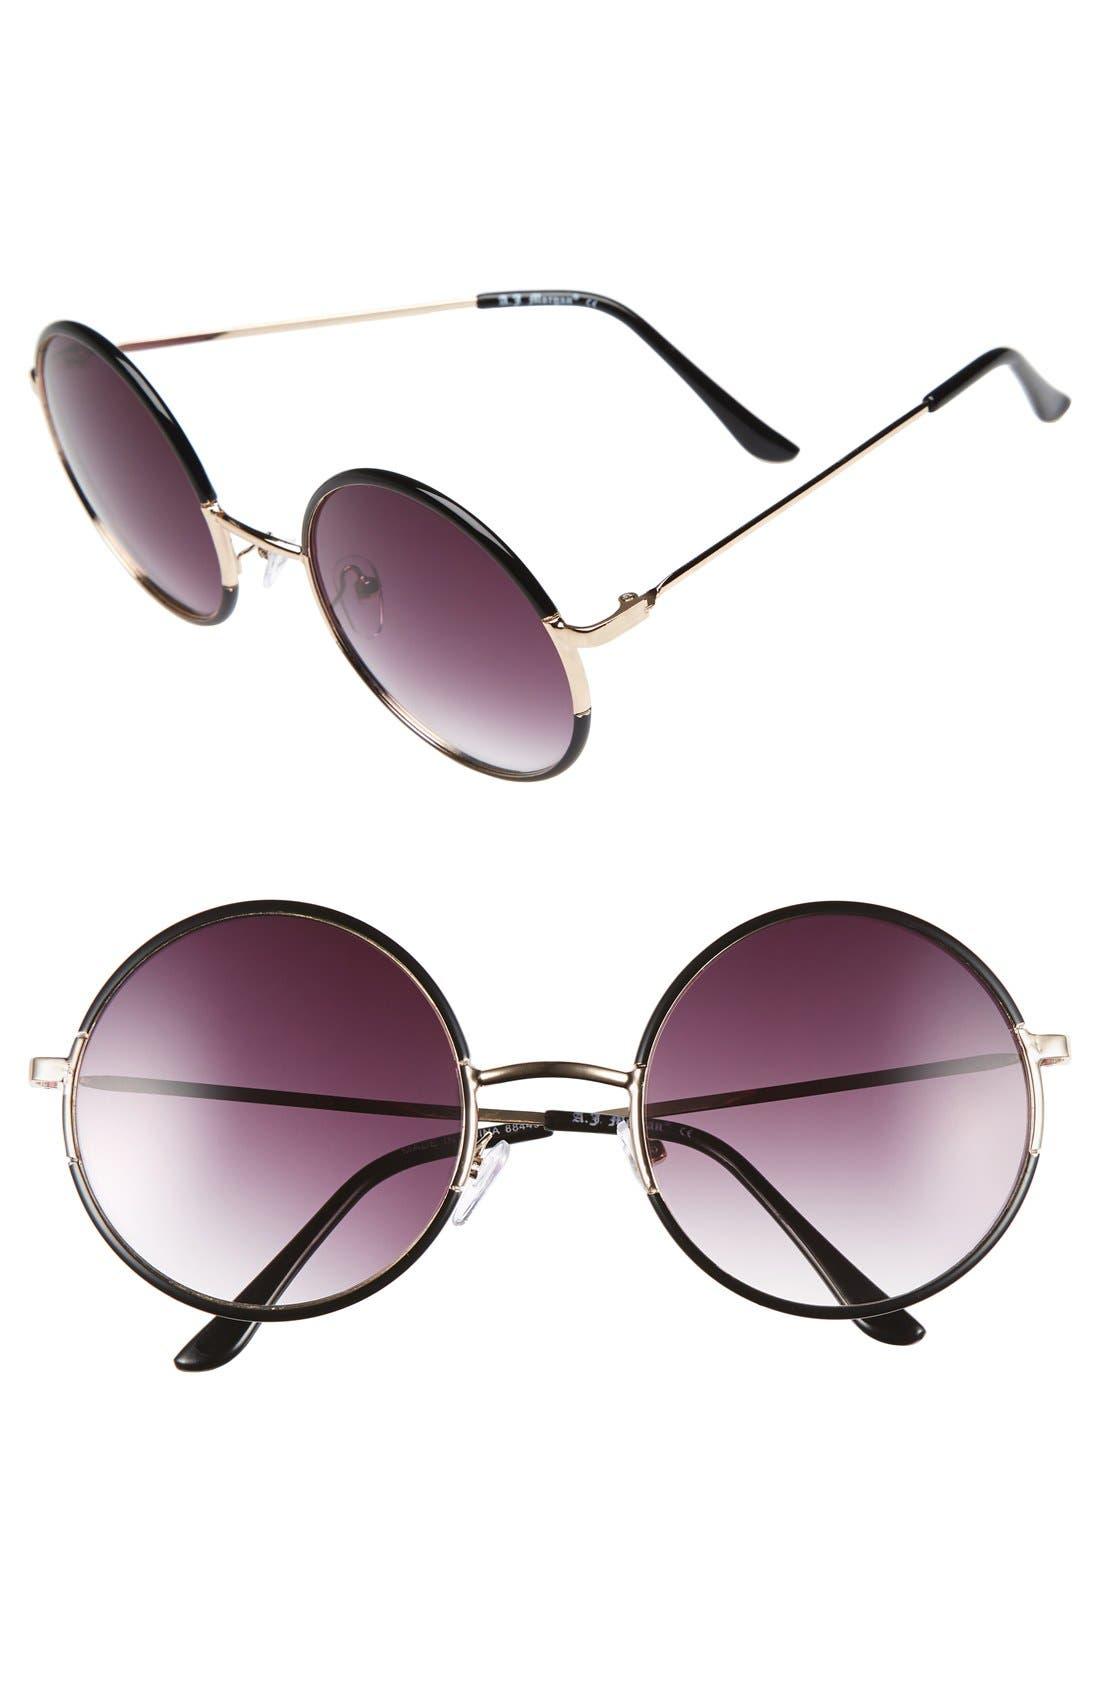 Main Image - A.J. Morgan 'Oh Nice' 55mm Round Sunglasses